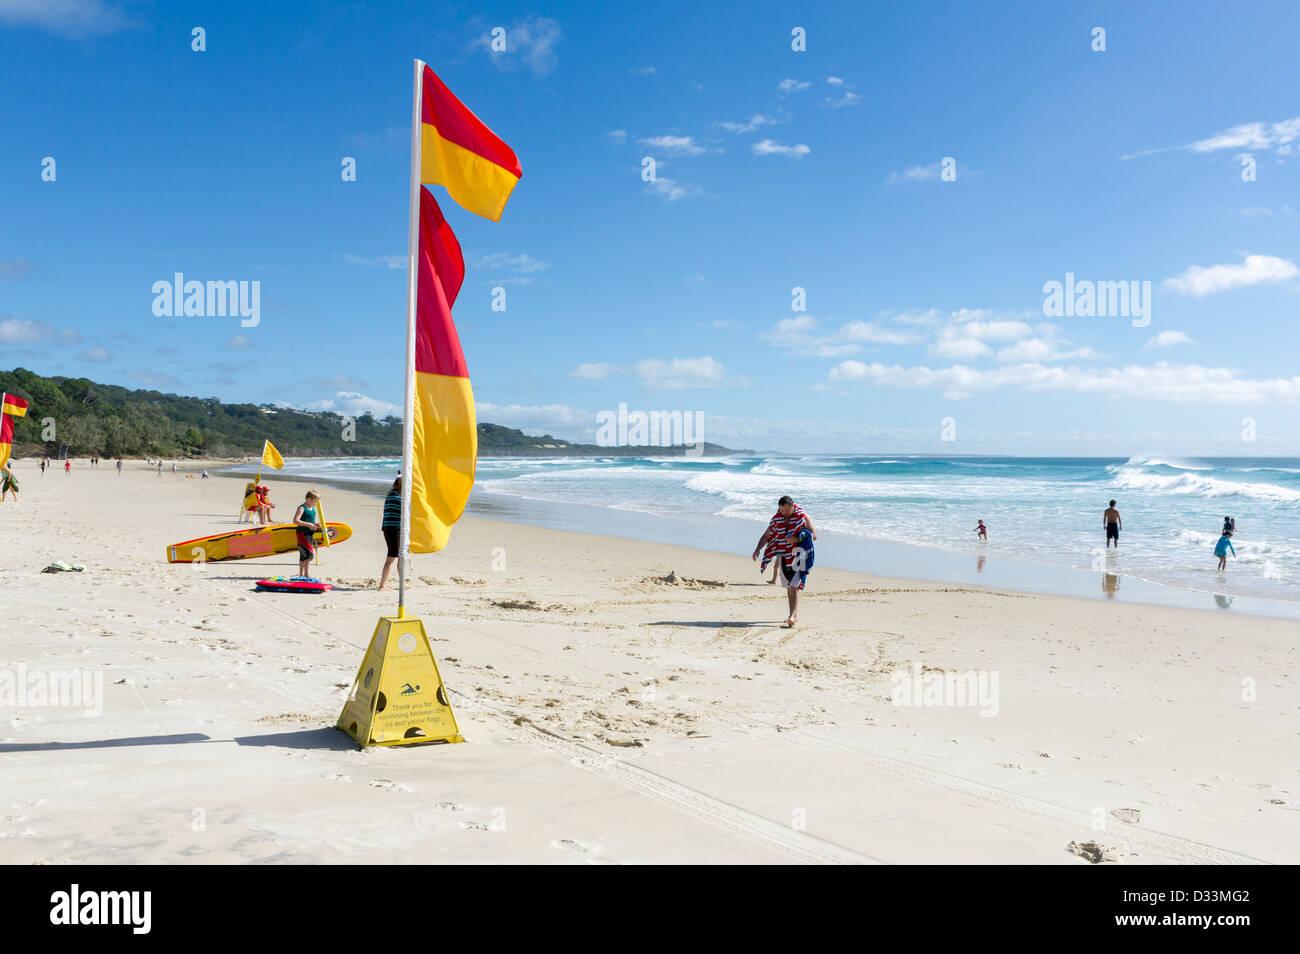 Cylinder Beach on North Stradbroke Island in Queensland, Australia - Stock Image